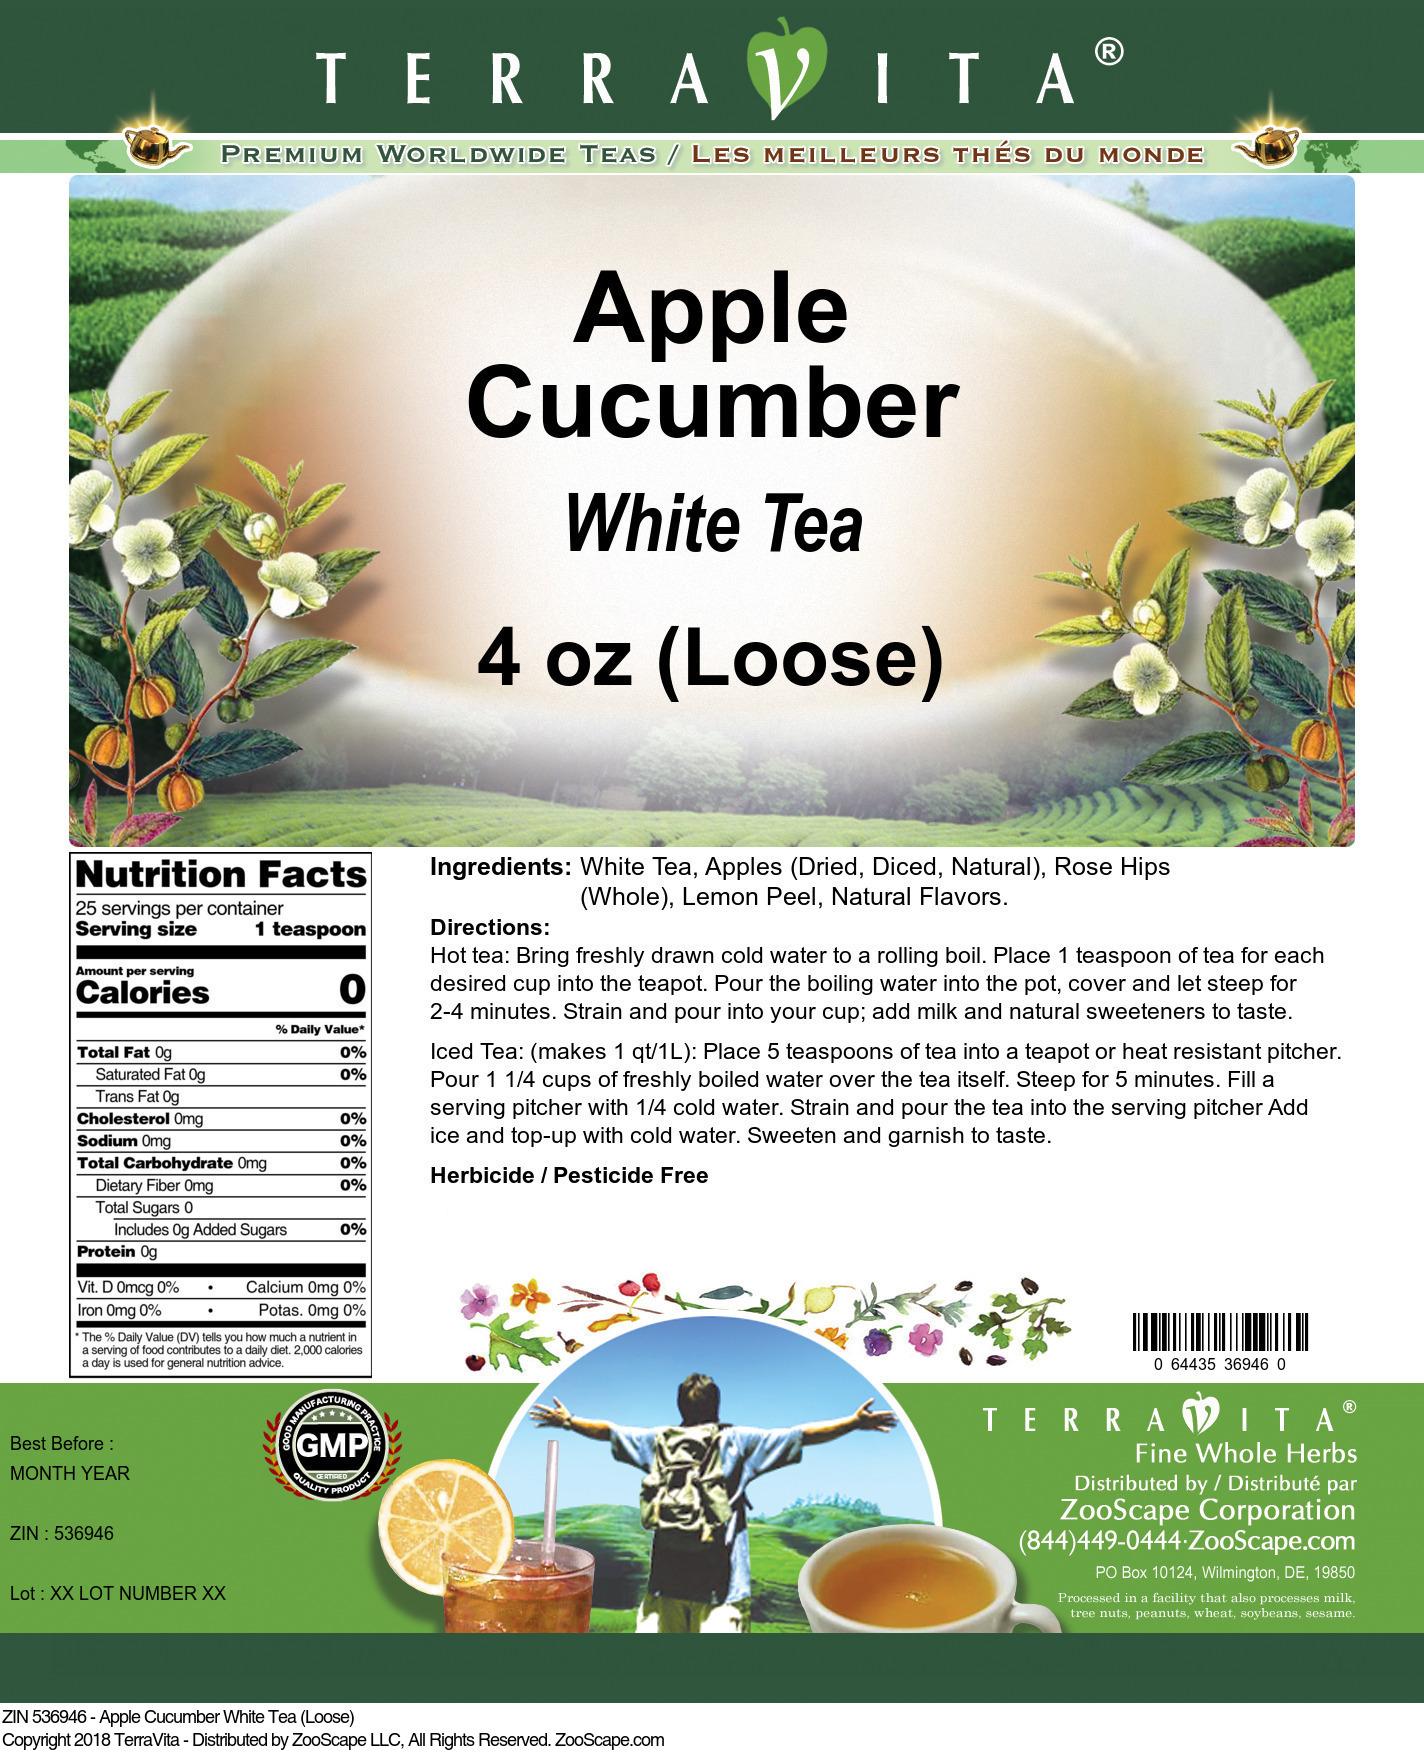 Apple Cucumber White Tea (Loose)